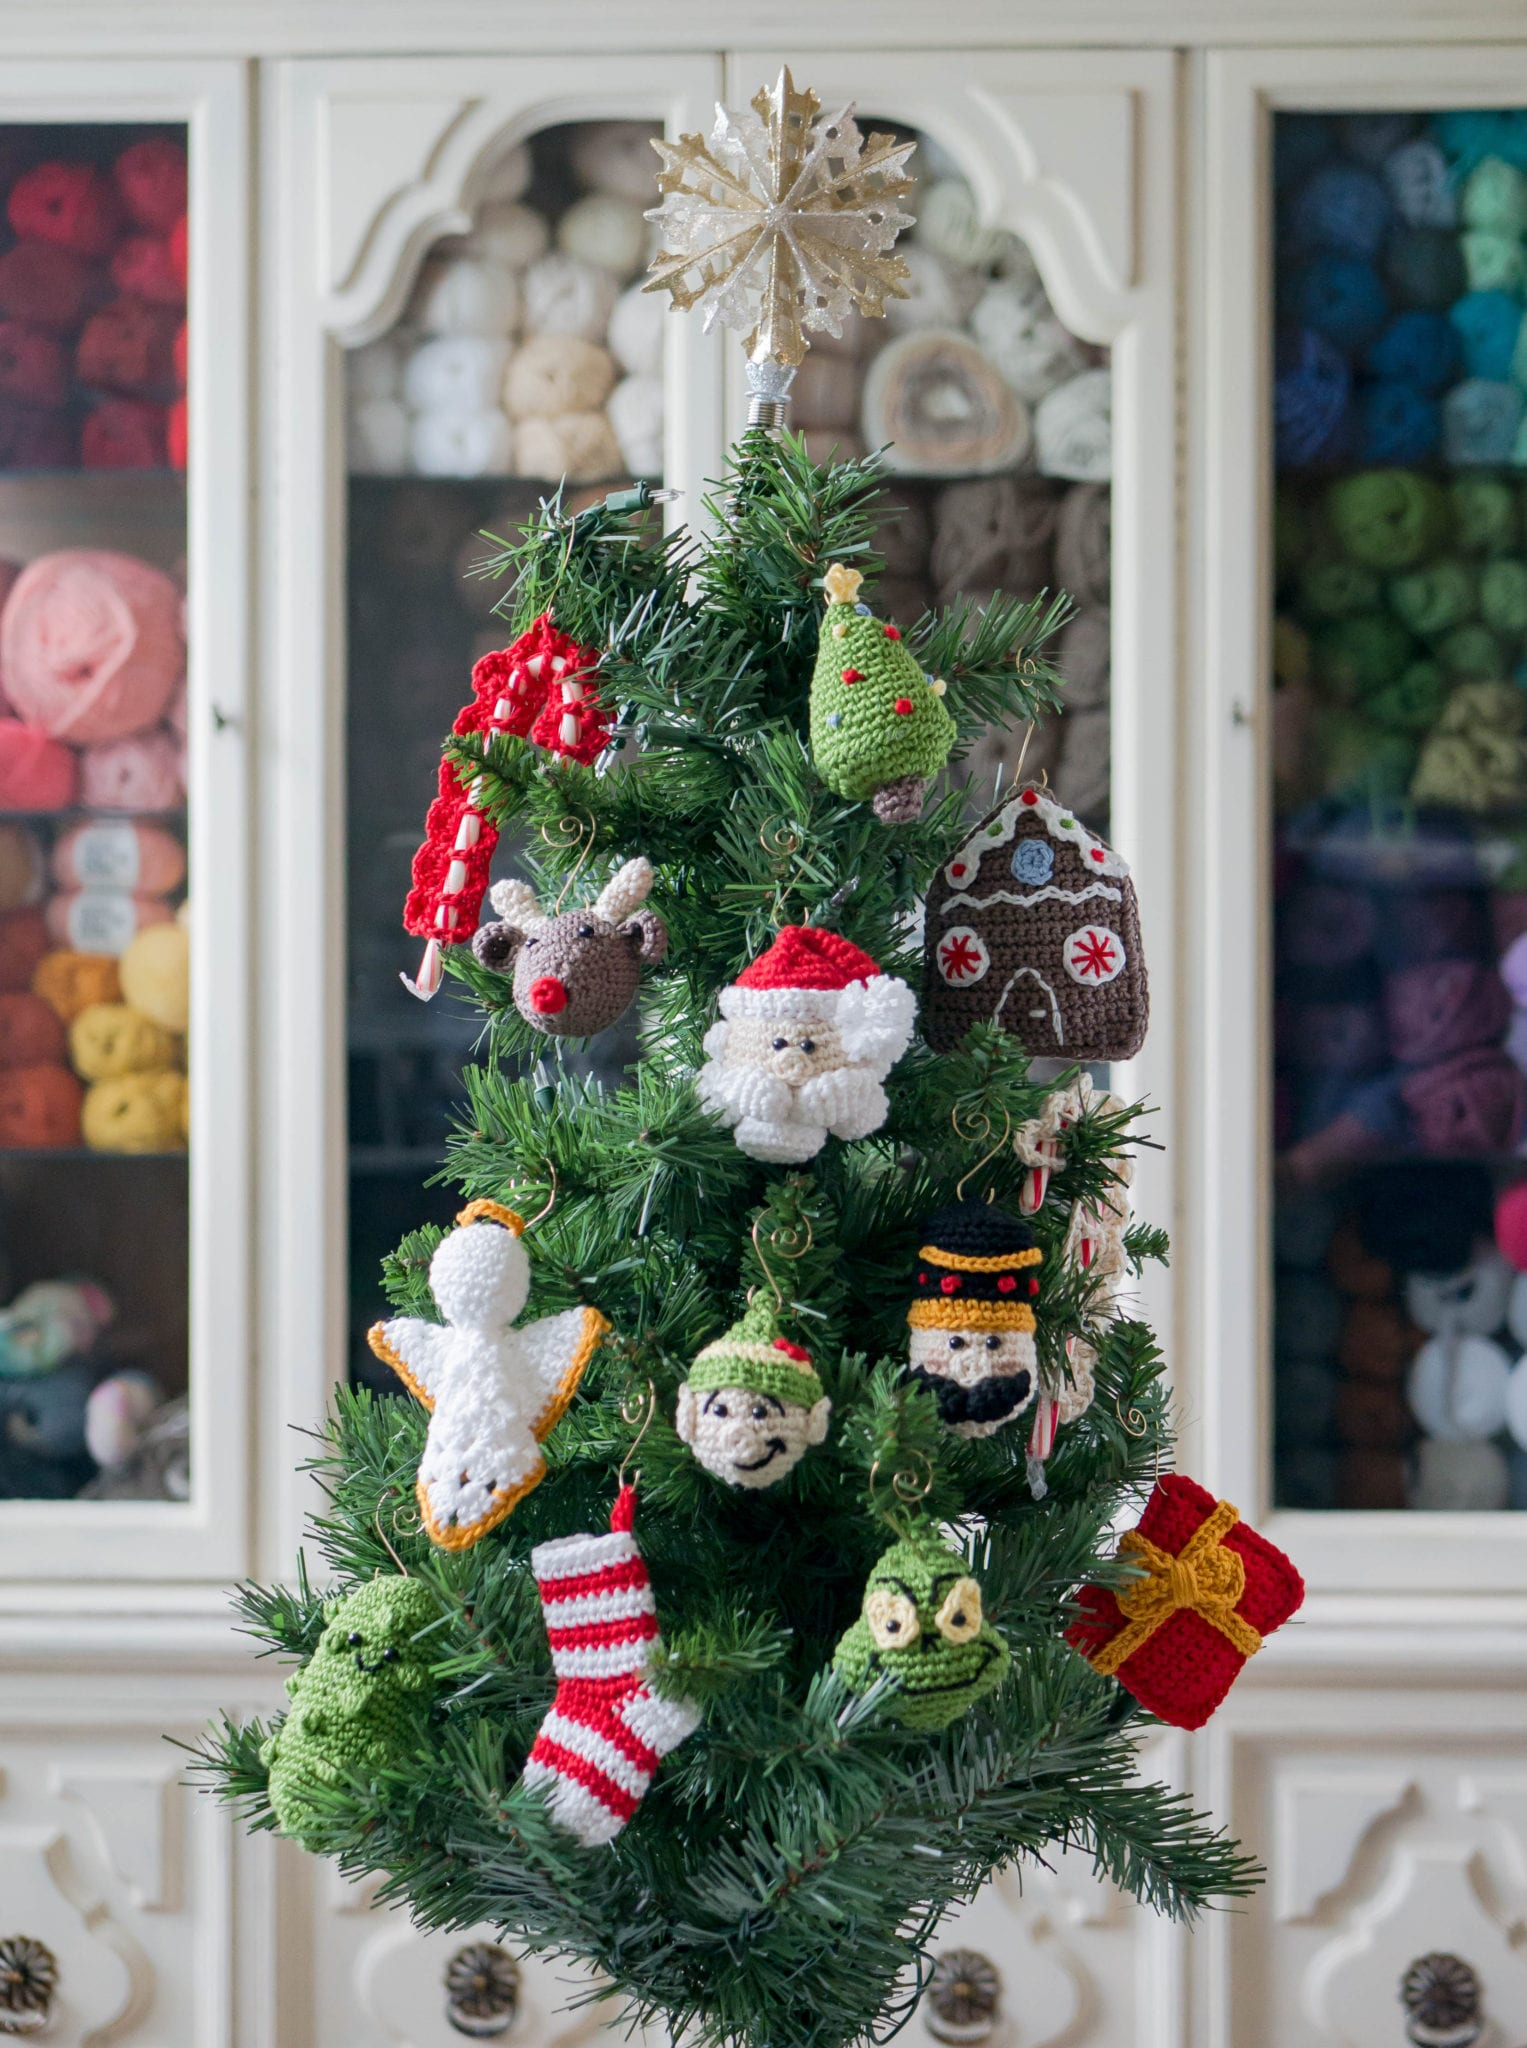 Crochet O Christmas Tree Ornament - Sewrella